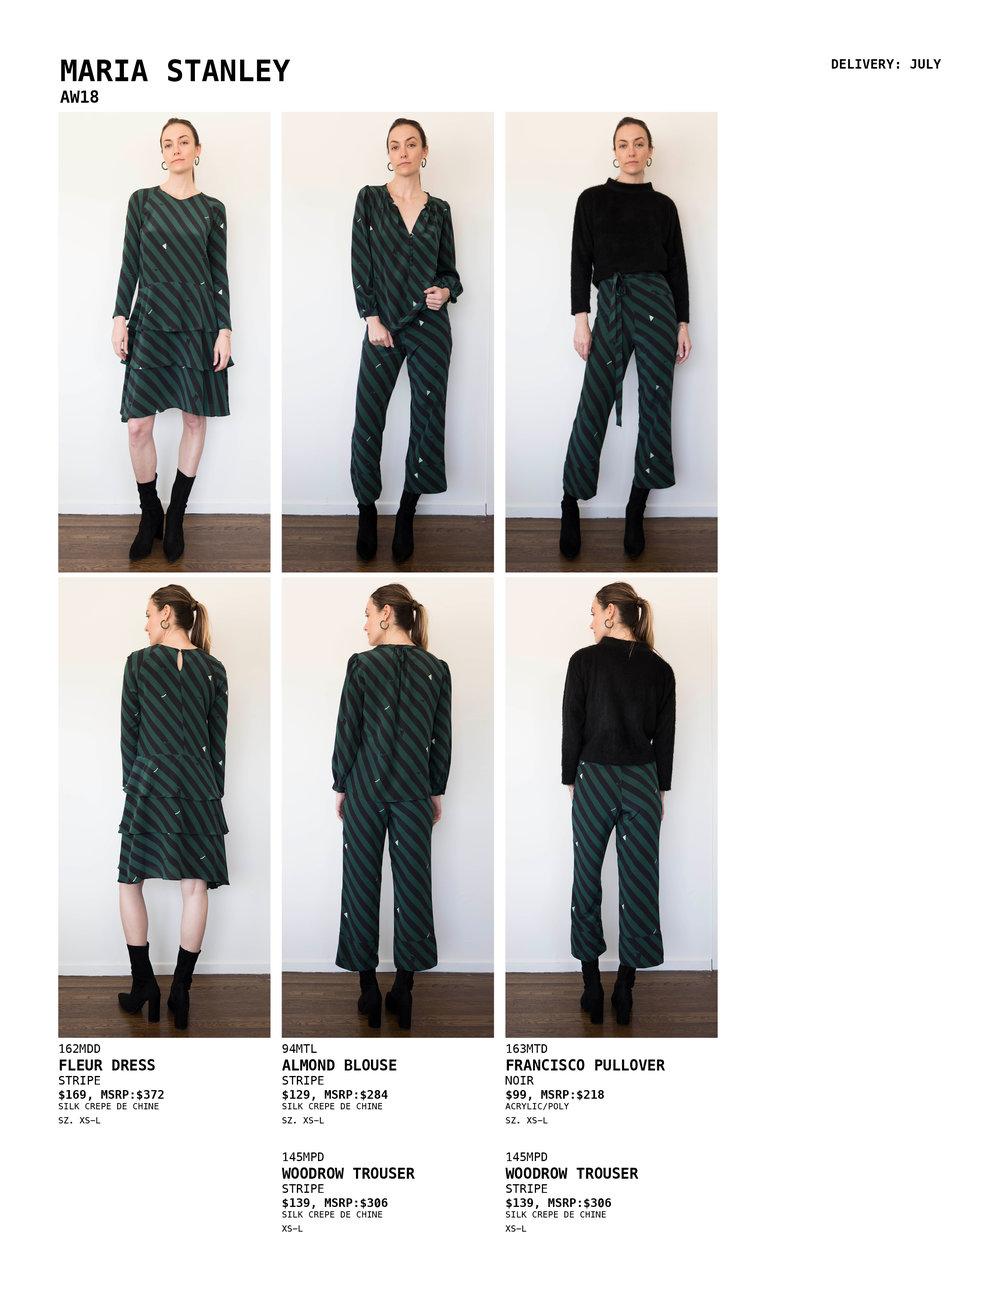 Maria Stanley AW18 Line Sheets - PRINT4.jpg